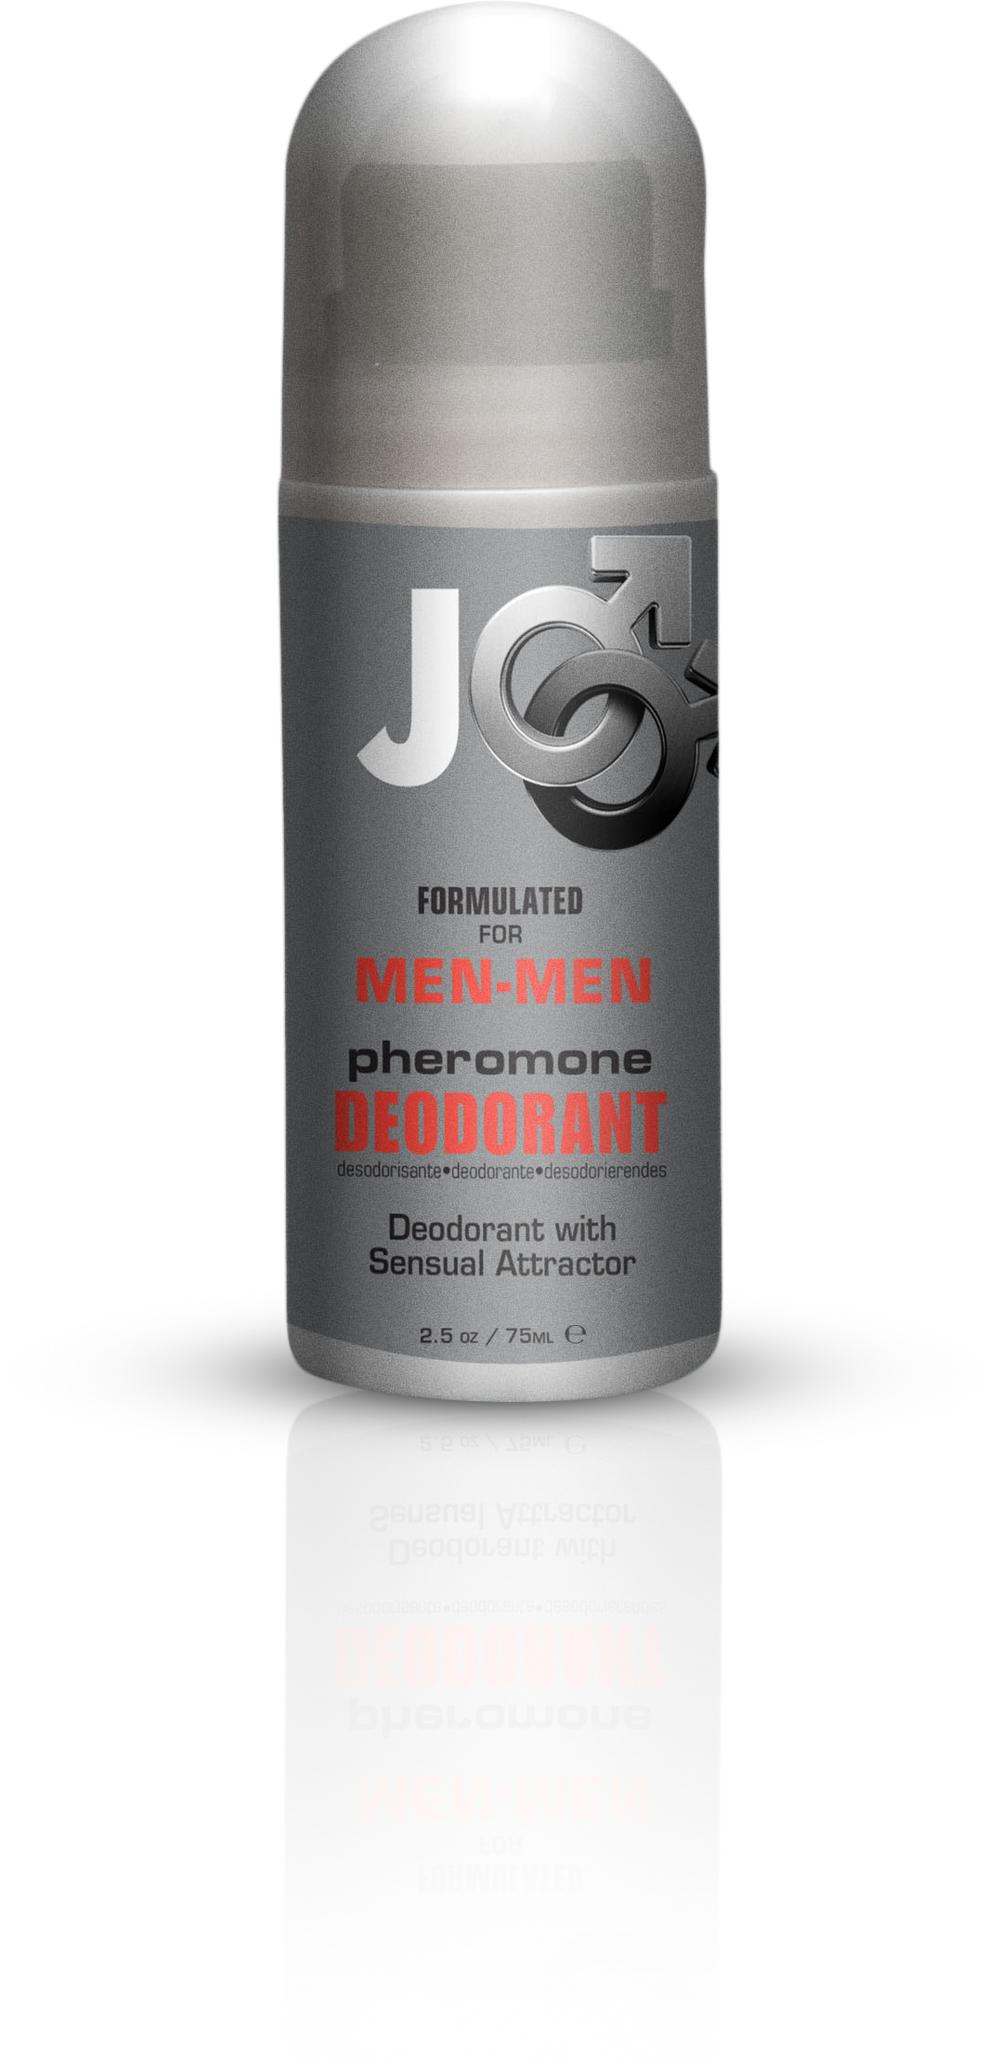 40224_JO_pheromone_deodorant_men-men_2.5oz.jpg